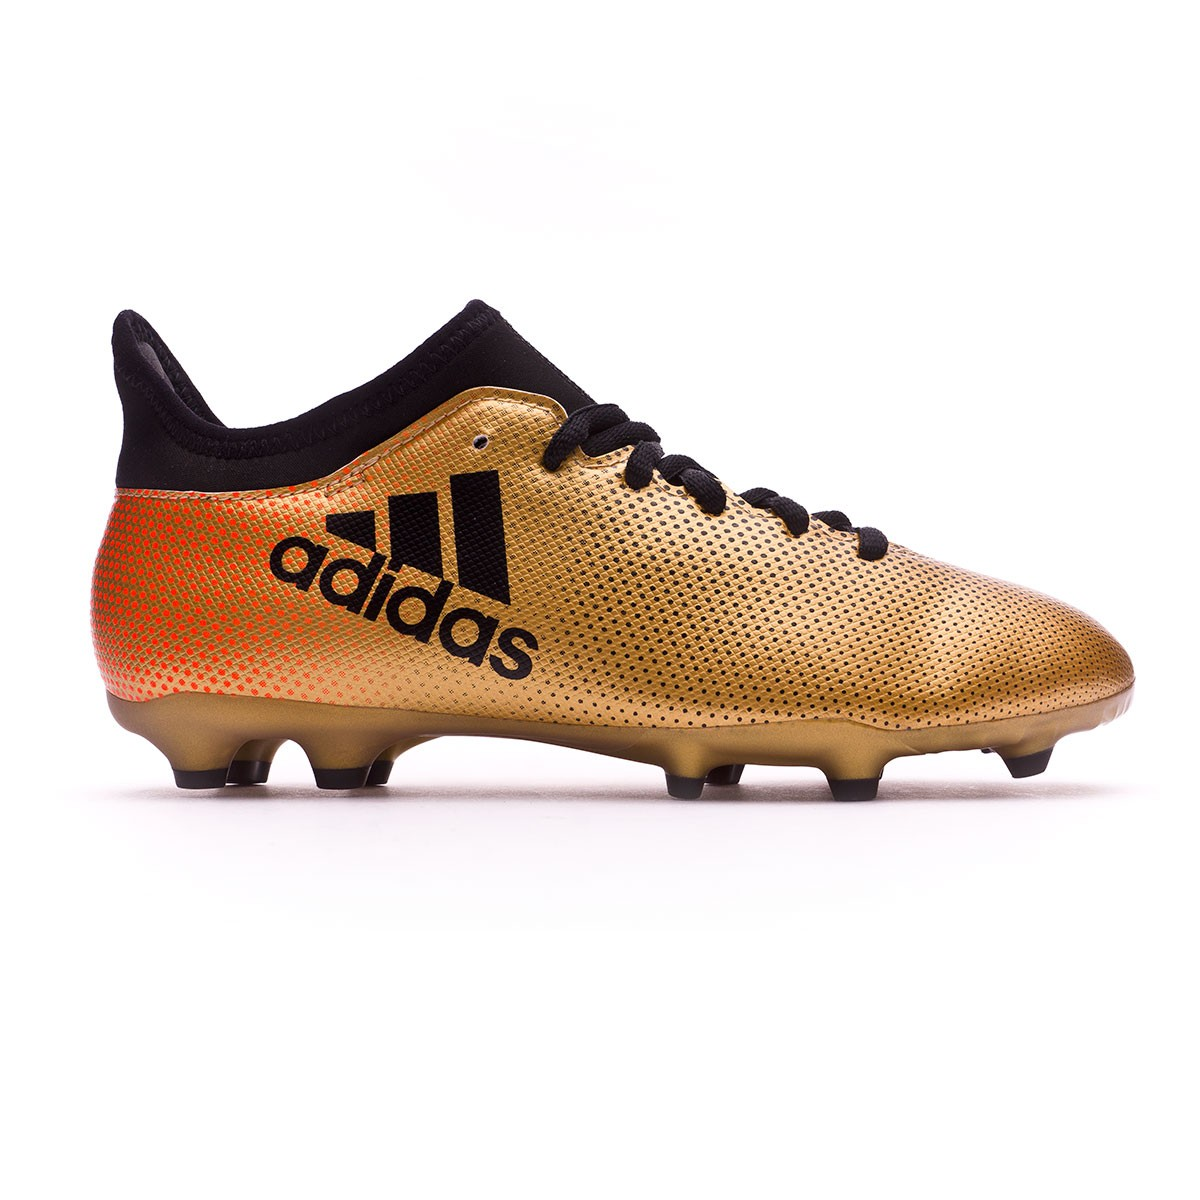 66e9a9e1b80b Football Boots adidas Kids X 17.3 FG Tactile gold metallic-Core black-Solar  red - Football store Fútbol Emotion